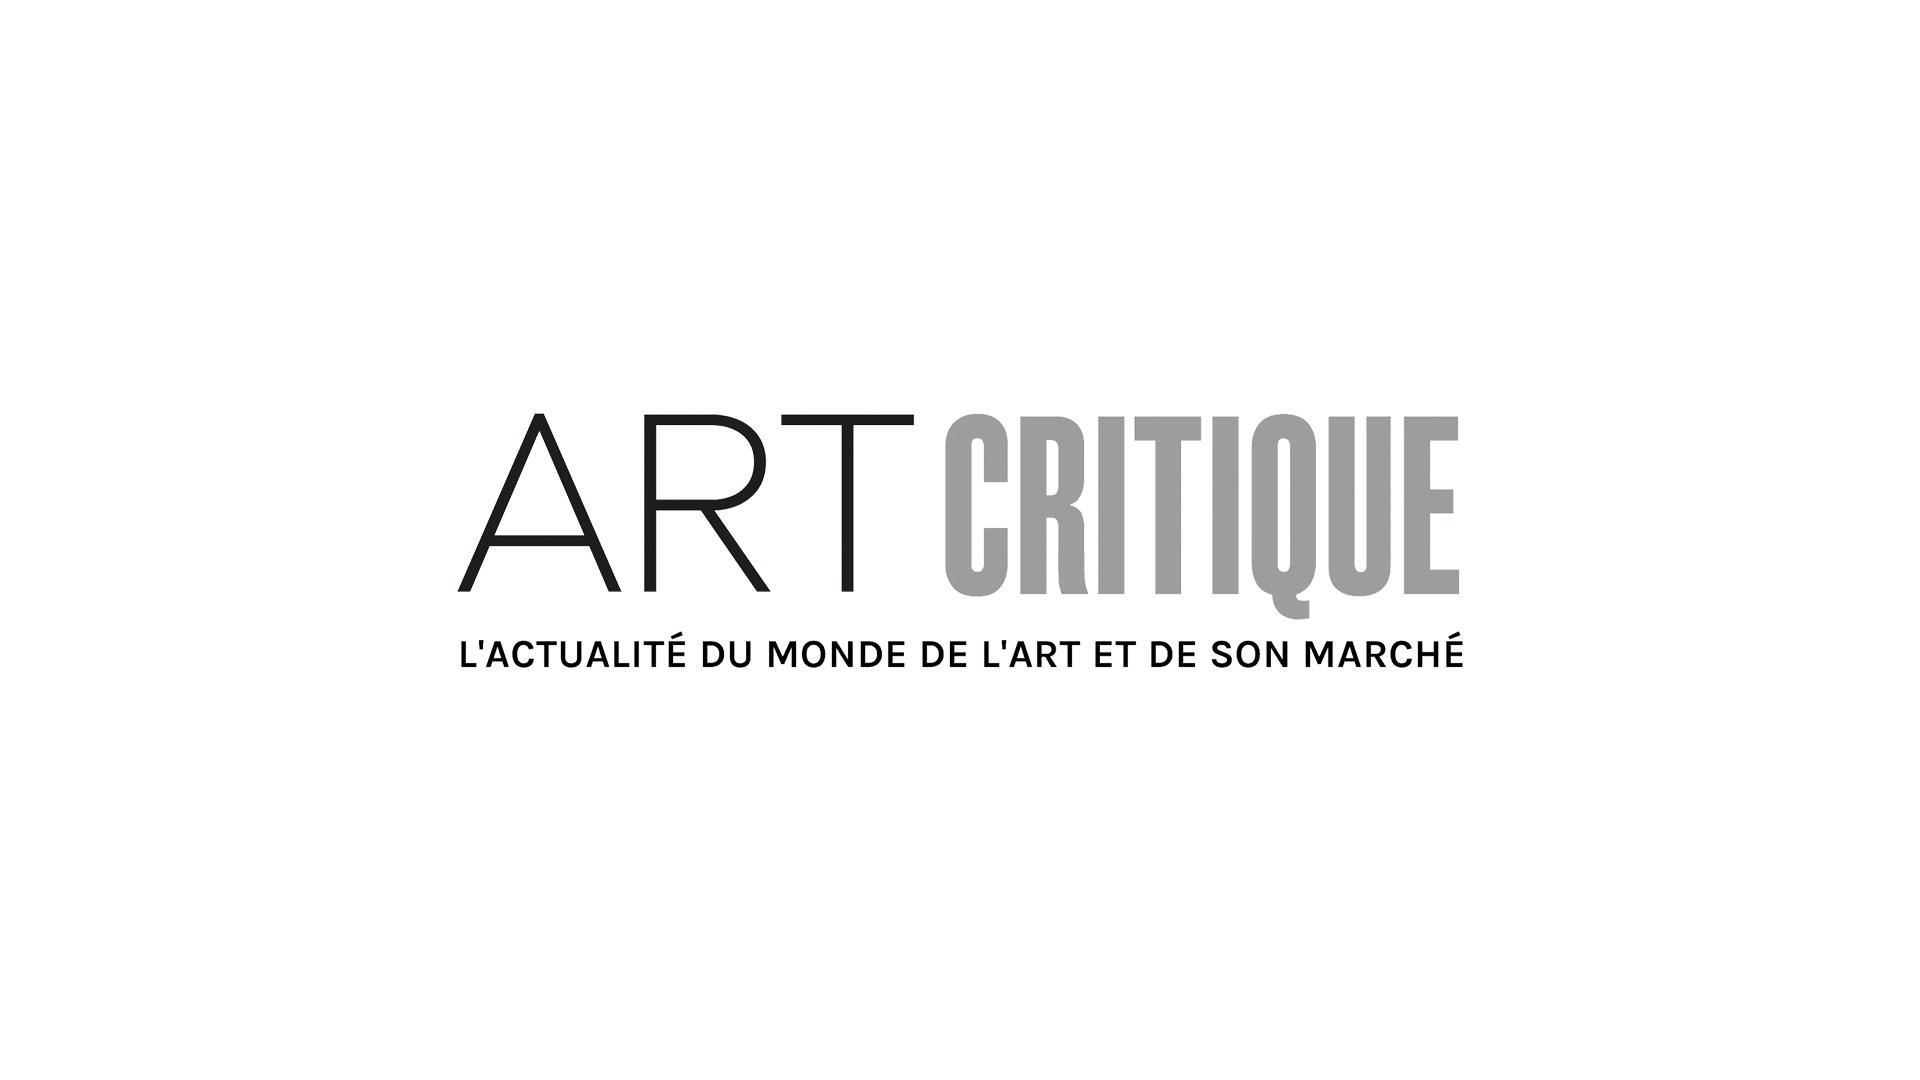 D.C.'s short-lived amendment to censor arts funding